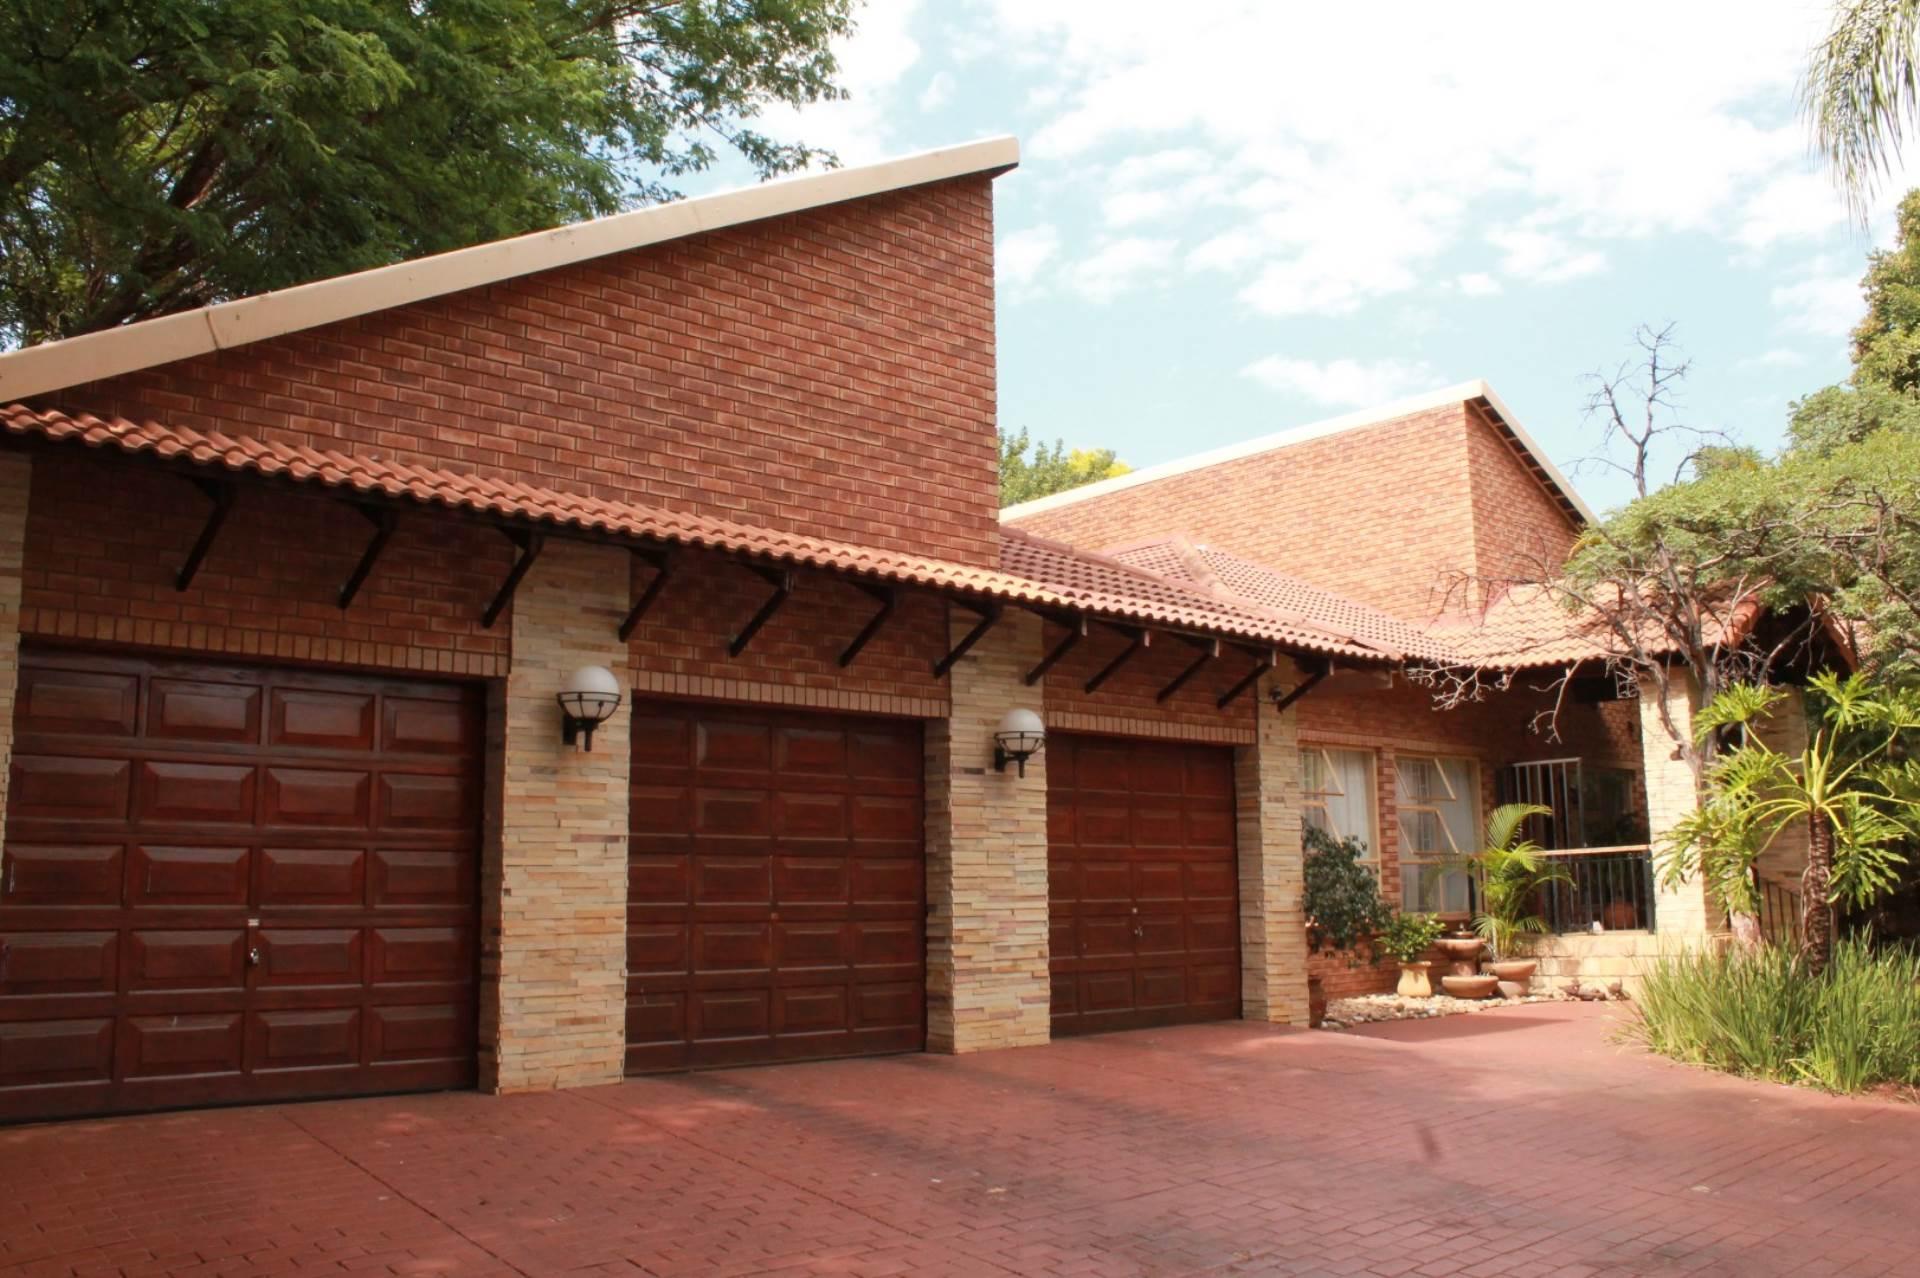 Akasia, Ninapark Property  | Houses For Sale Ninapark, NINAPARK, House 5 bedrooms property for sale Price:2,680,000